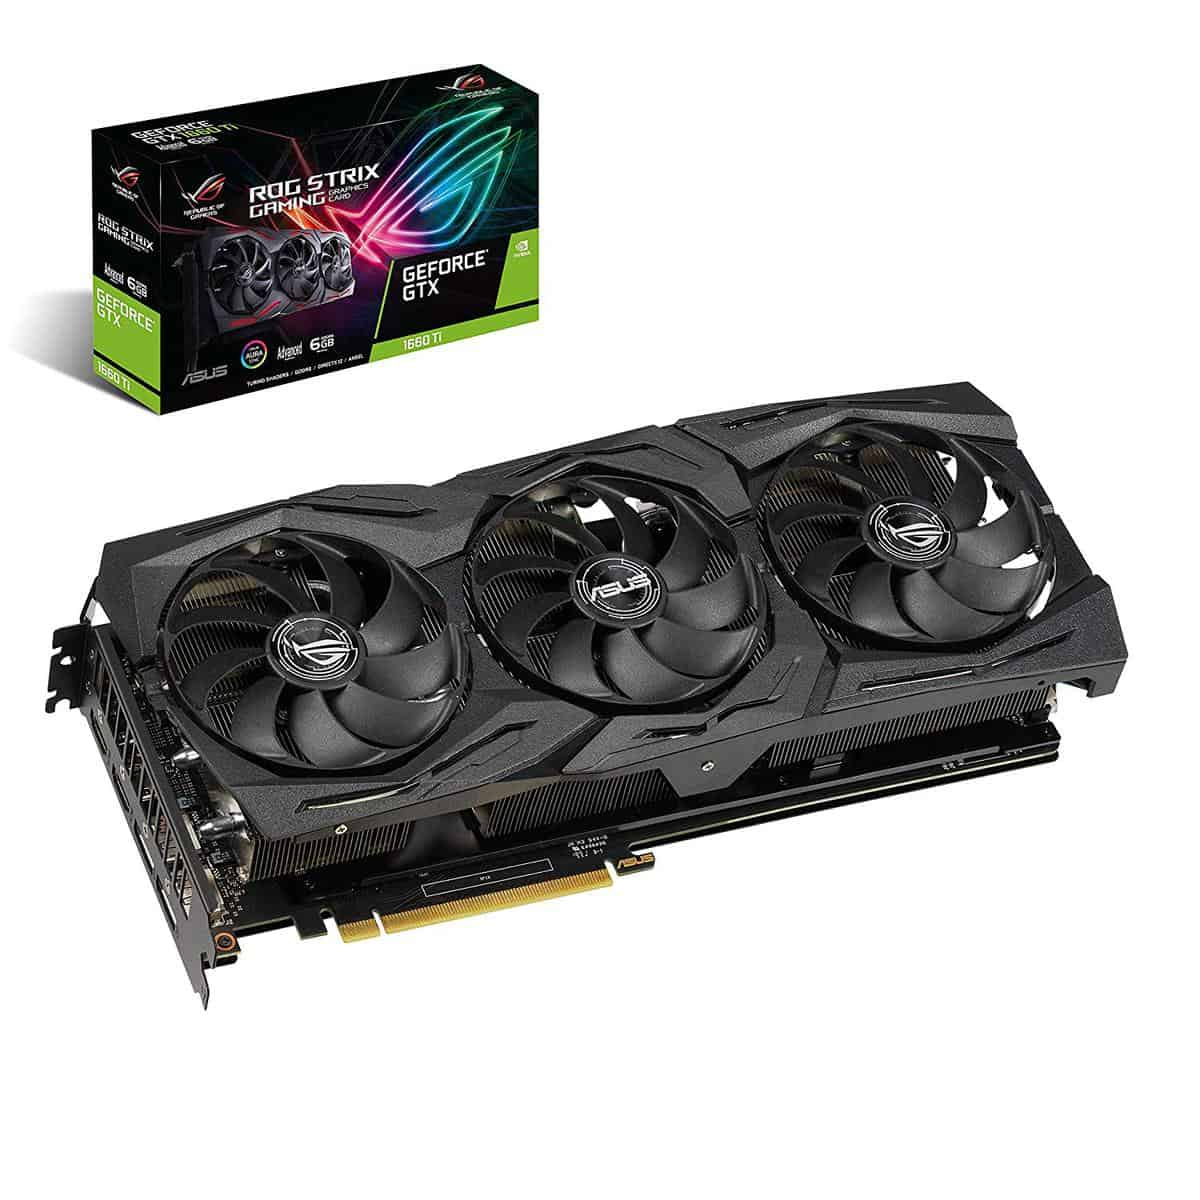 ASUS ROG Strix GeForce GTX 1660 Ti Advanced Edition